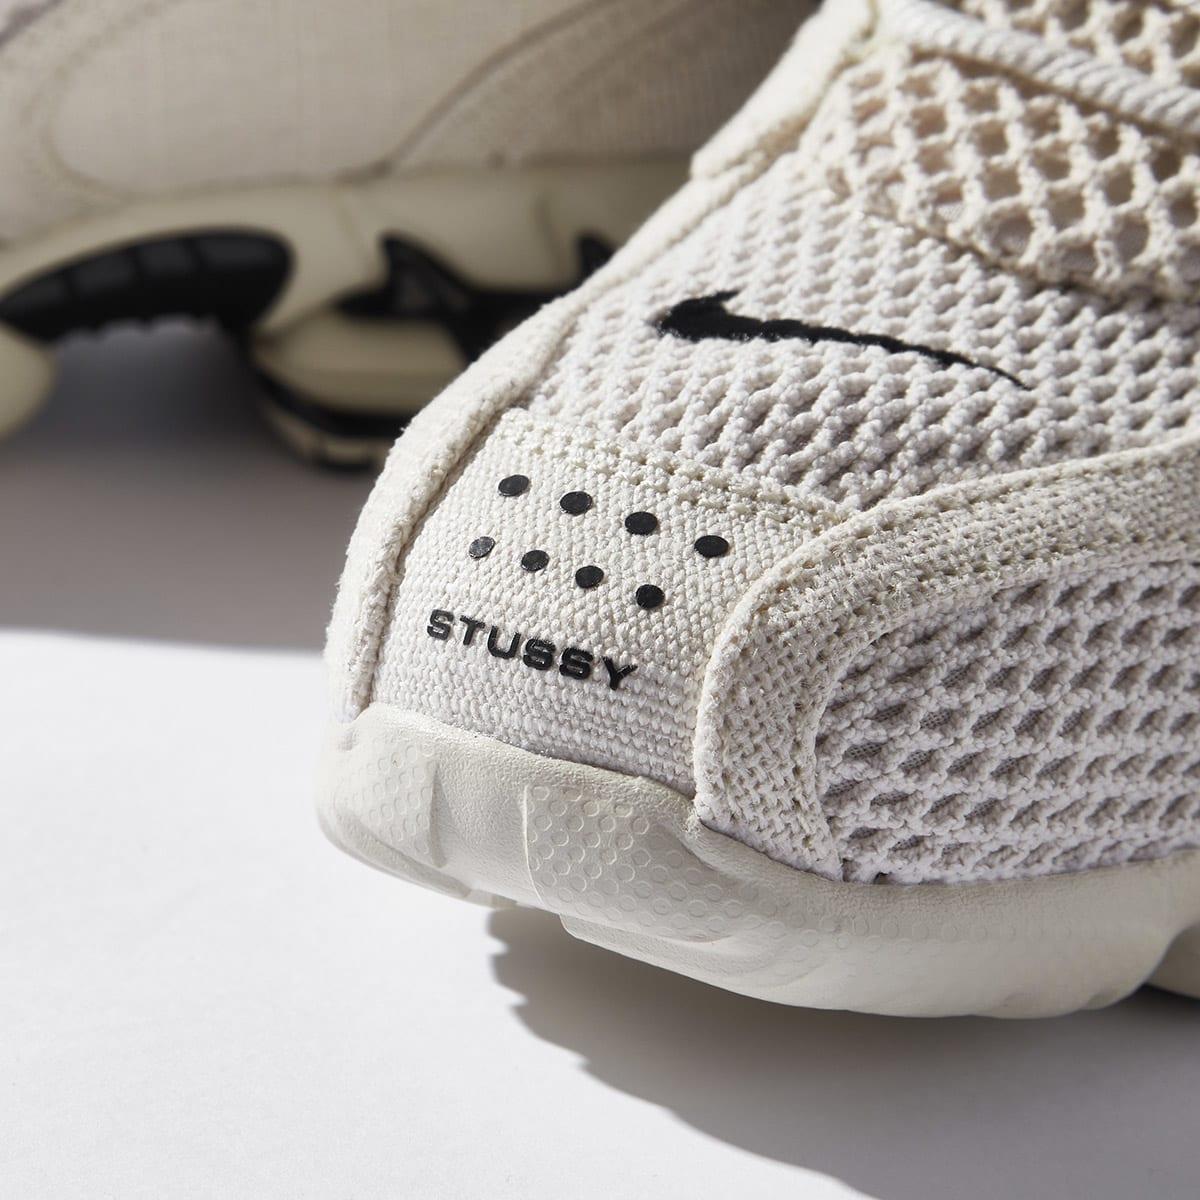 Nike x Stussy Air Zoom Spiridon Cage 2 - CG5486-200